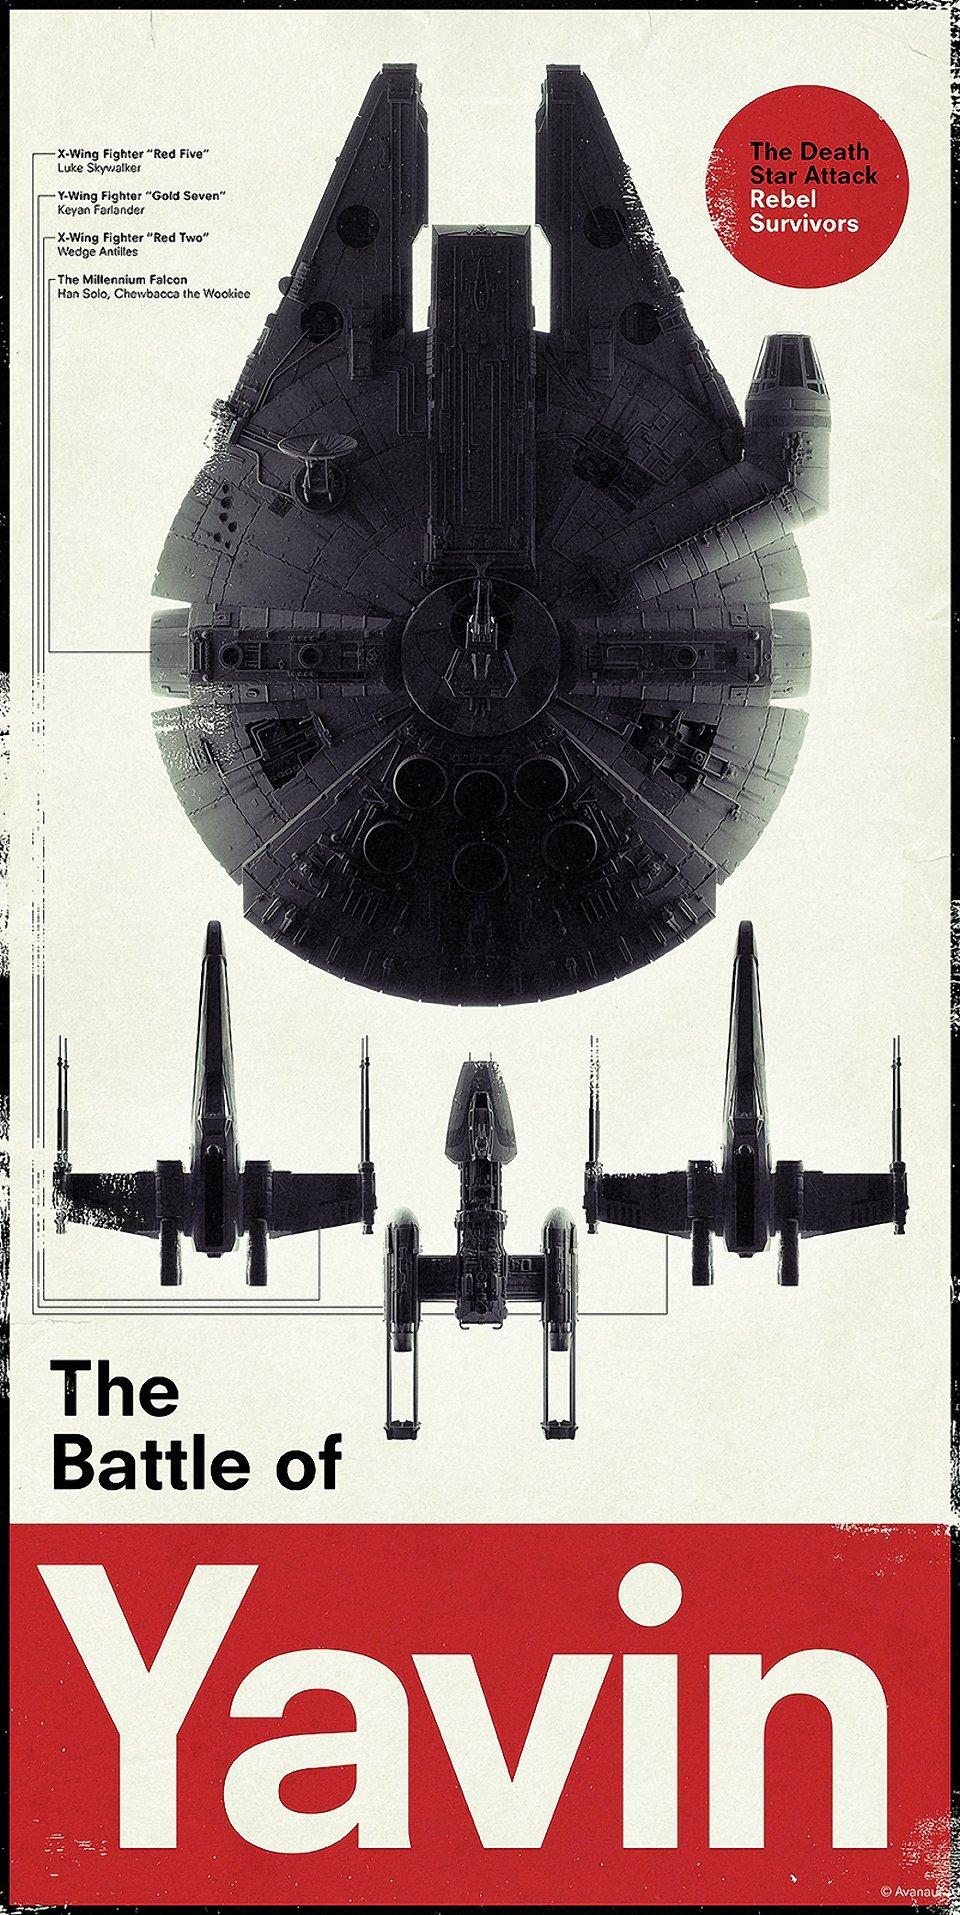 Star Wars: The Battle of Yavin Rebel Survivors